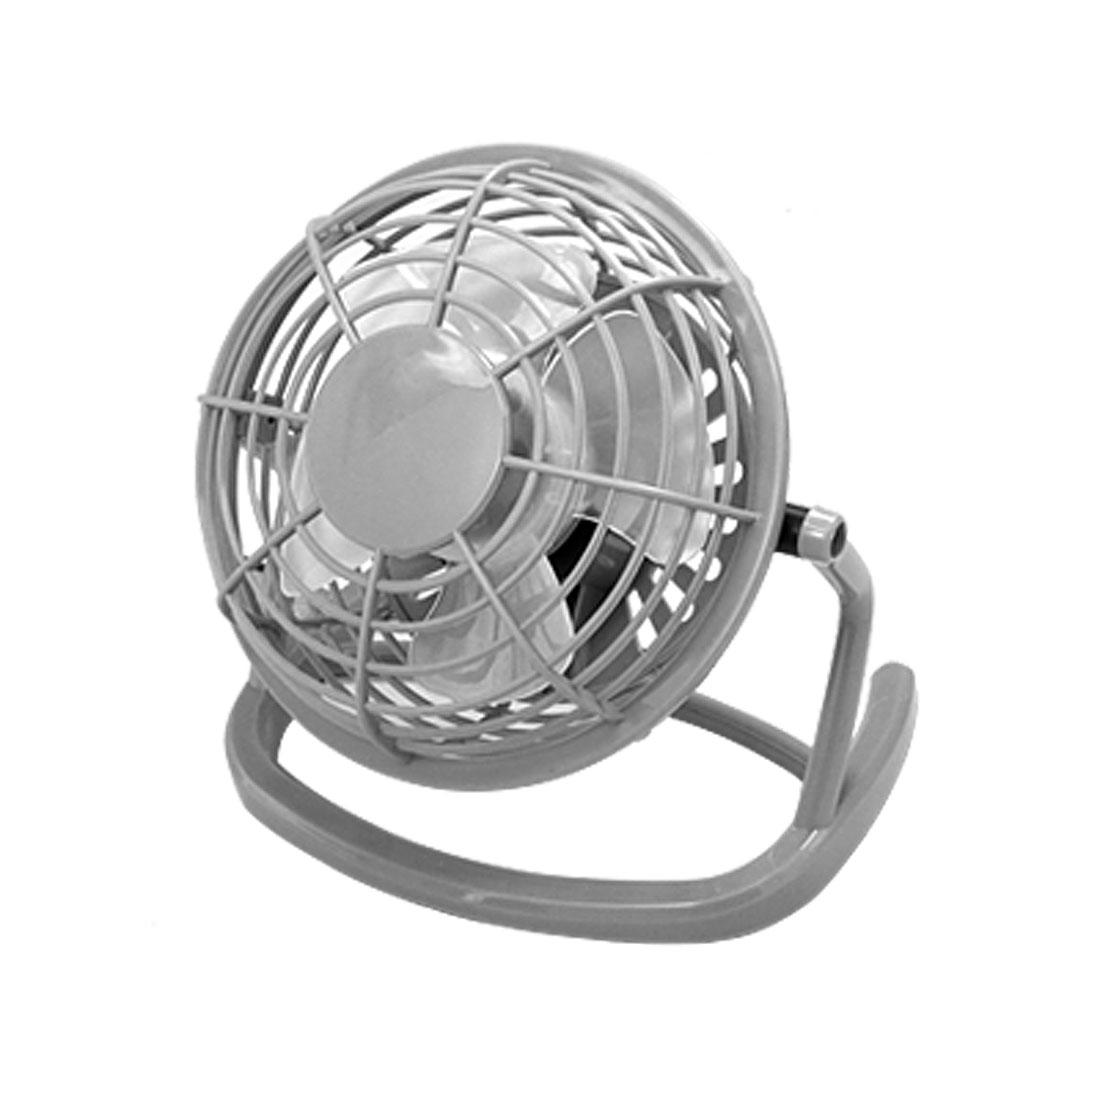 Four Free Angle USB Plastic Laptop Desktop Cooler Cooling Fan